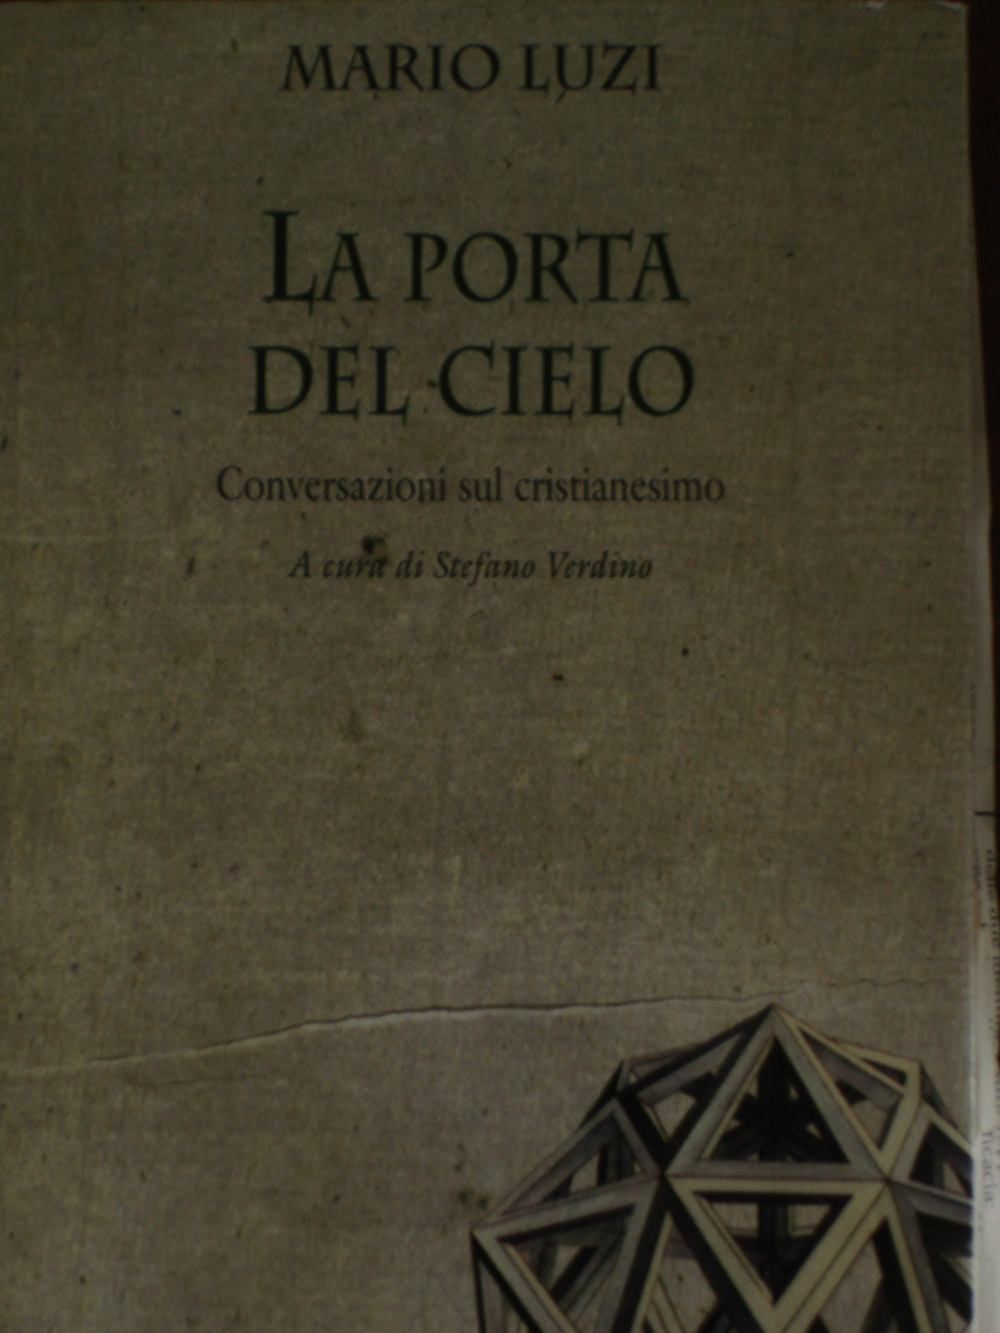 La Porta del Cielo - Mario Luzi